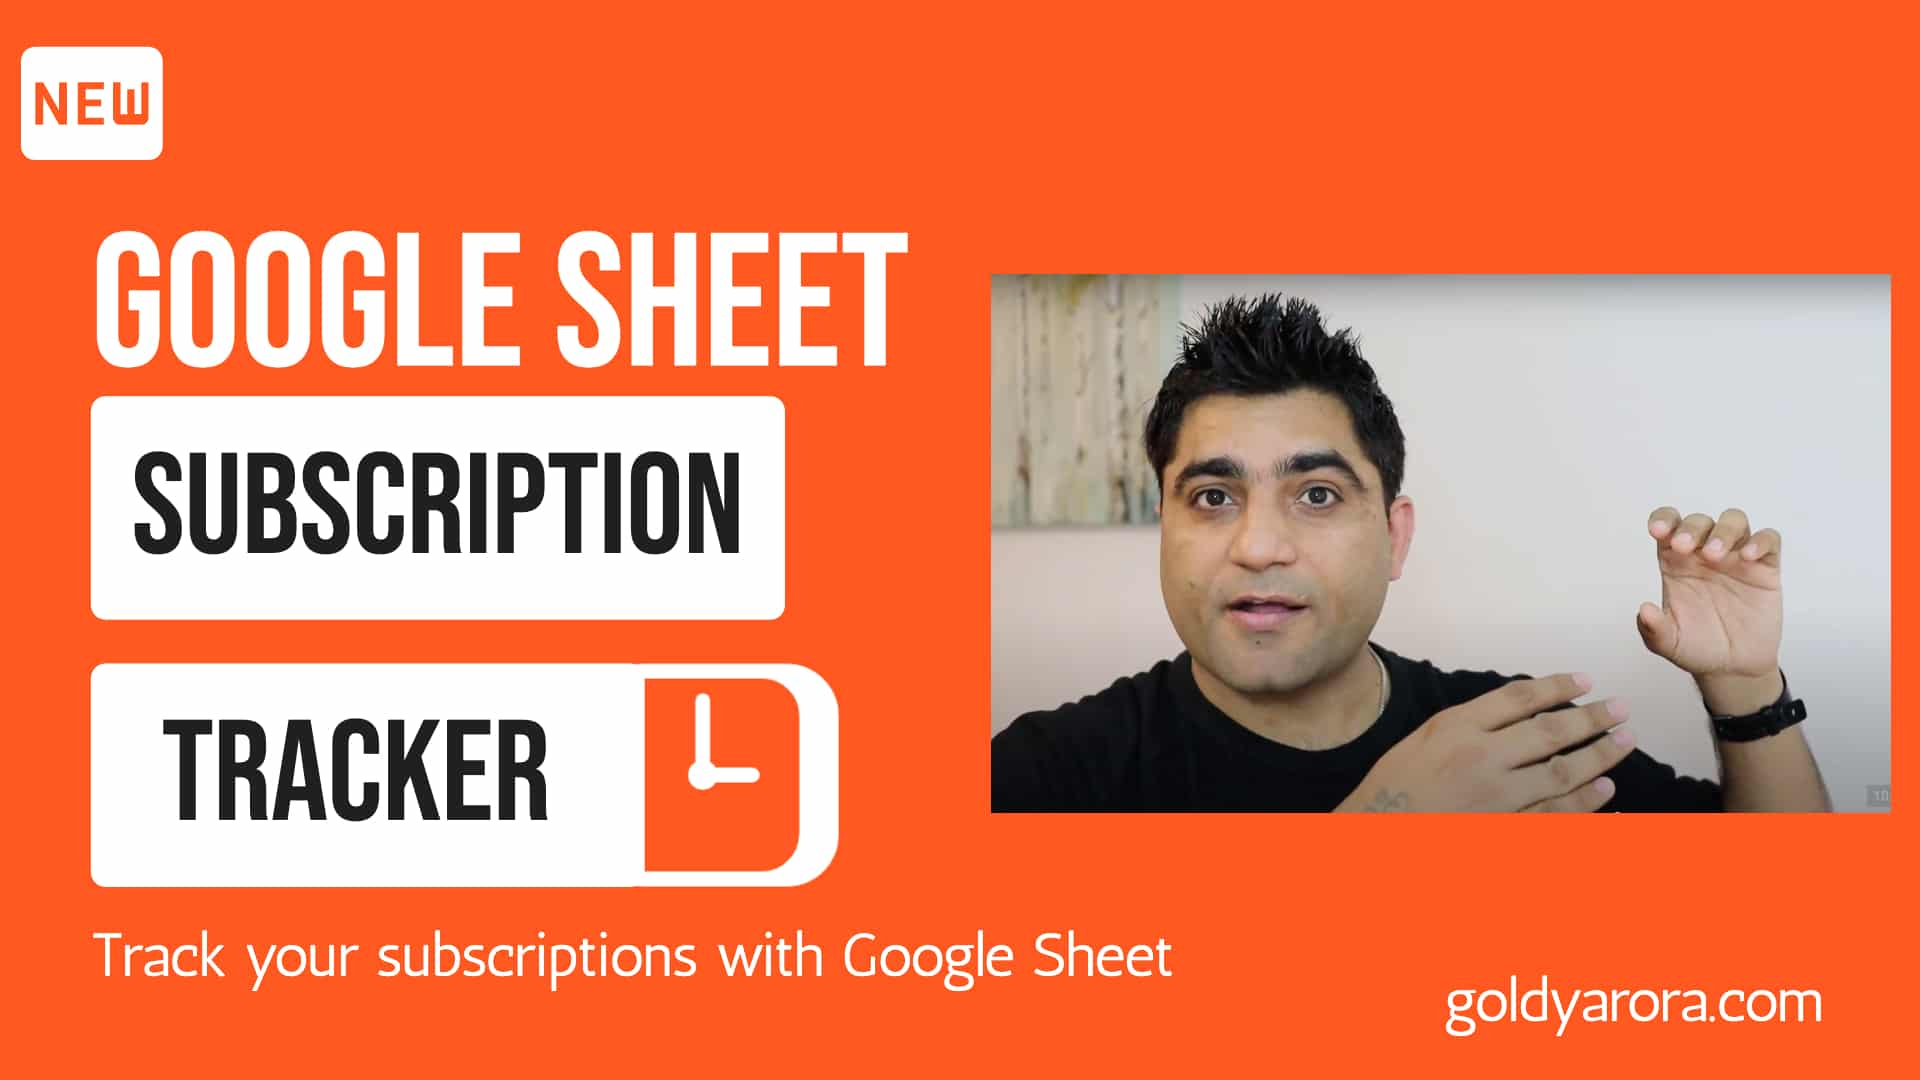 Google Sheet Subscription Tracker